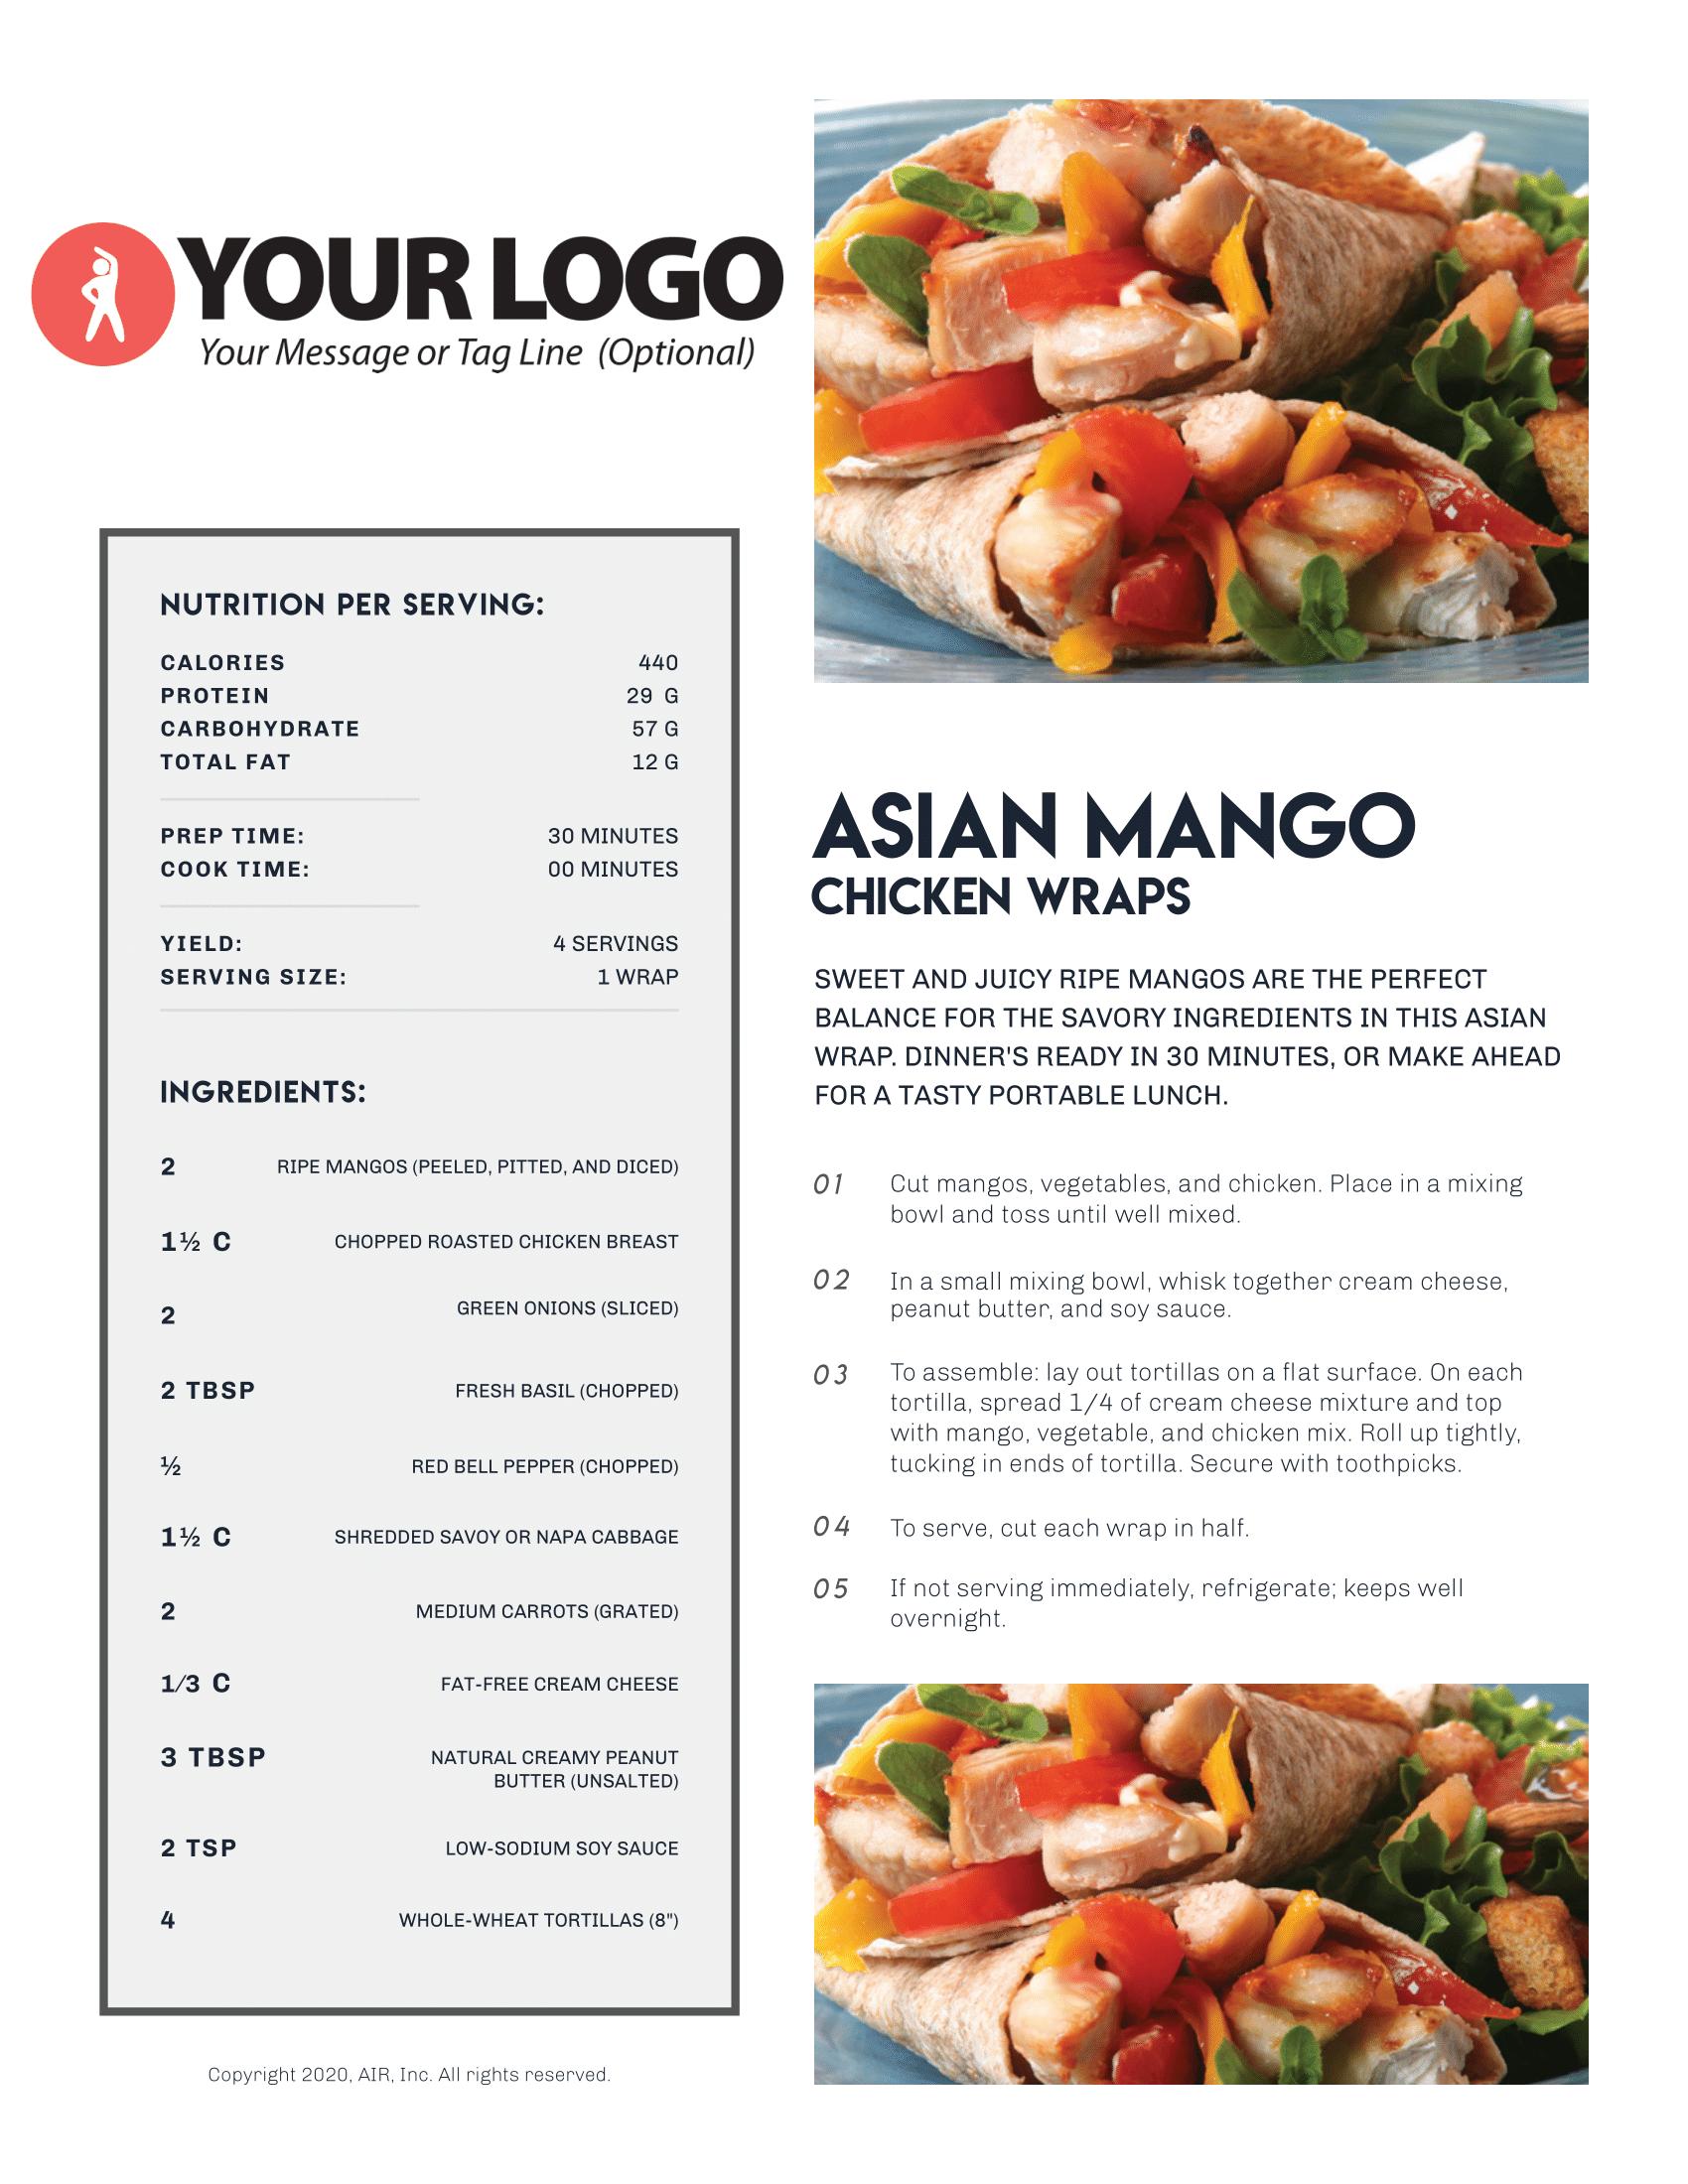 101a_Asian_Mango_Chicken_Wrap-1 2